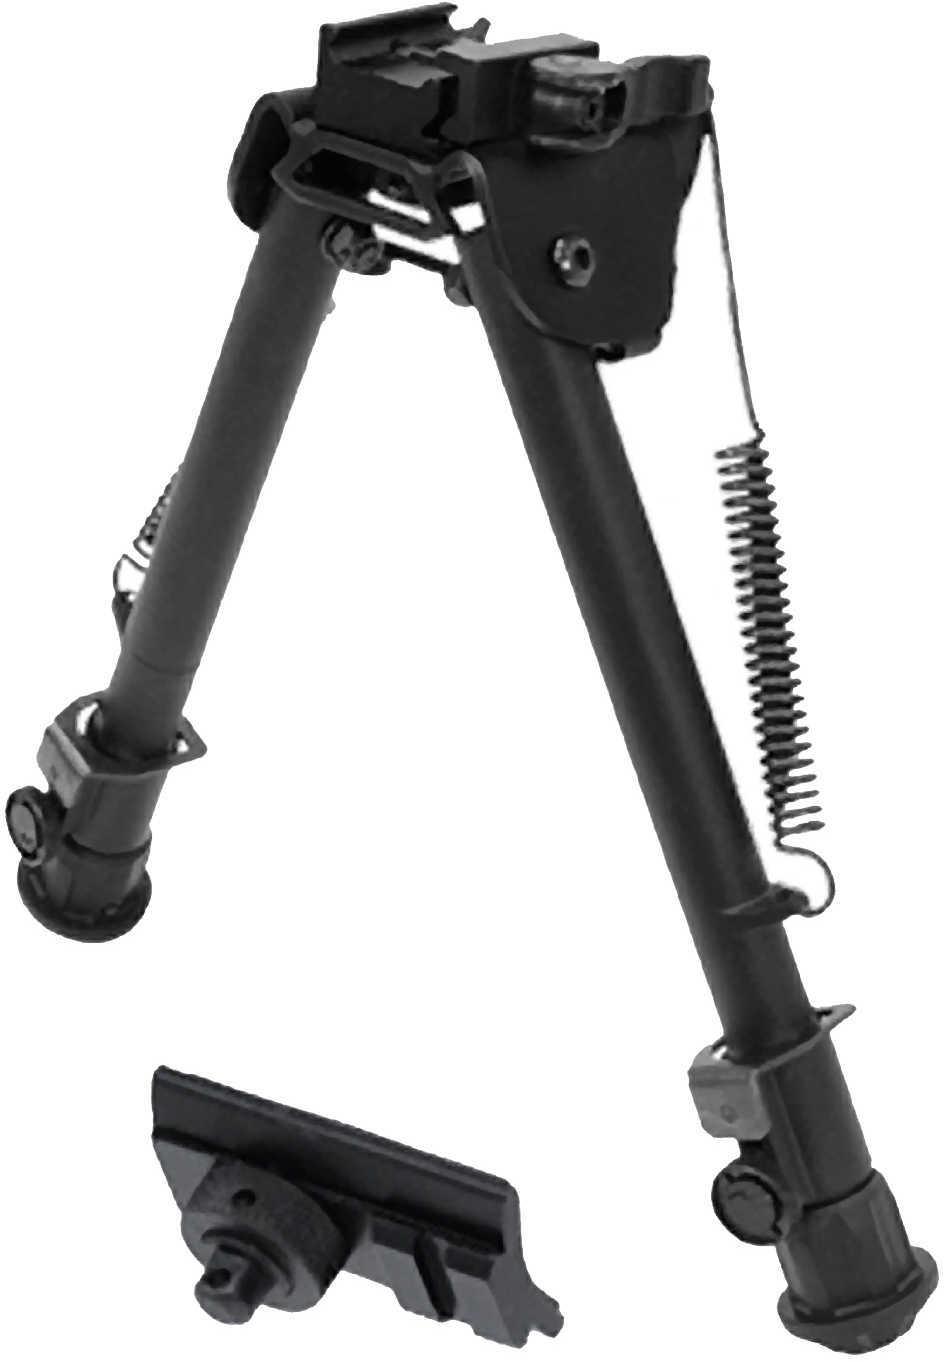 "UTG Tl-BP88Q Tactical Op Bipod With QD Lever Mount Black Metal 8-12.4"""